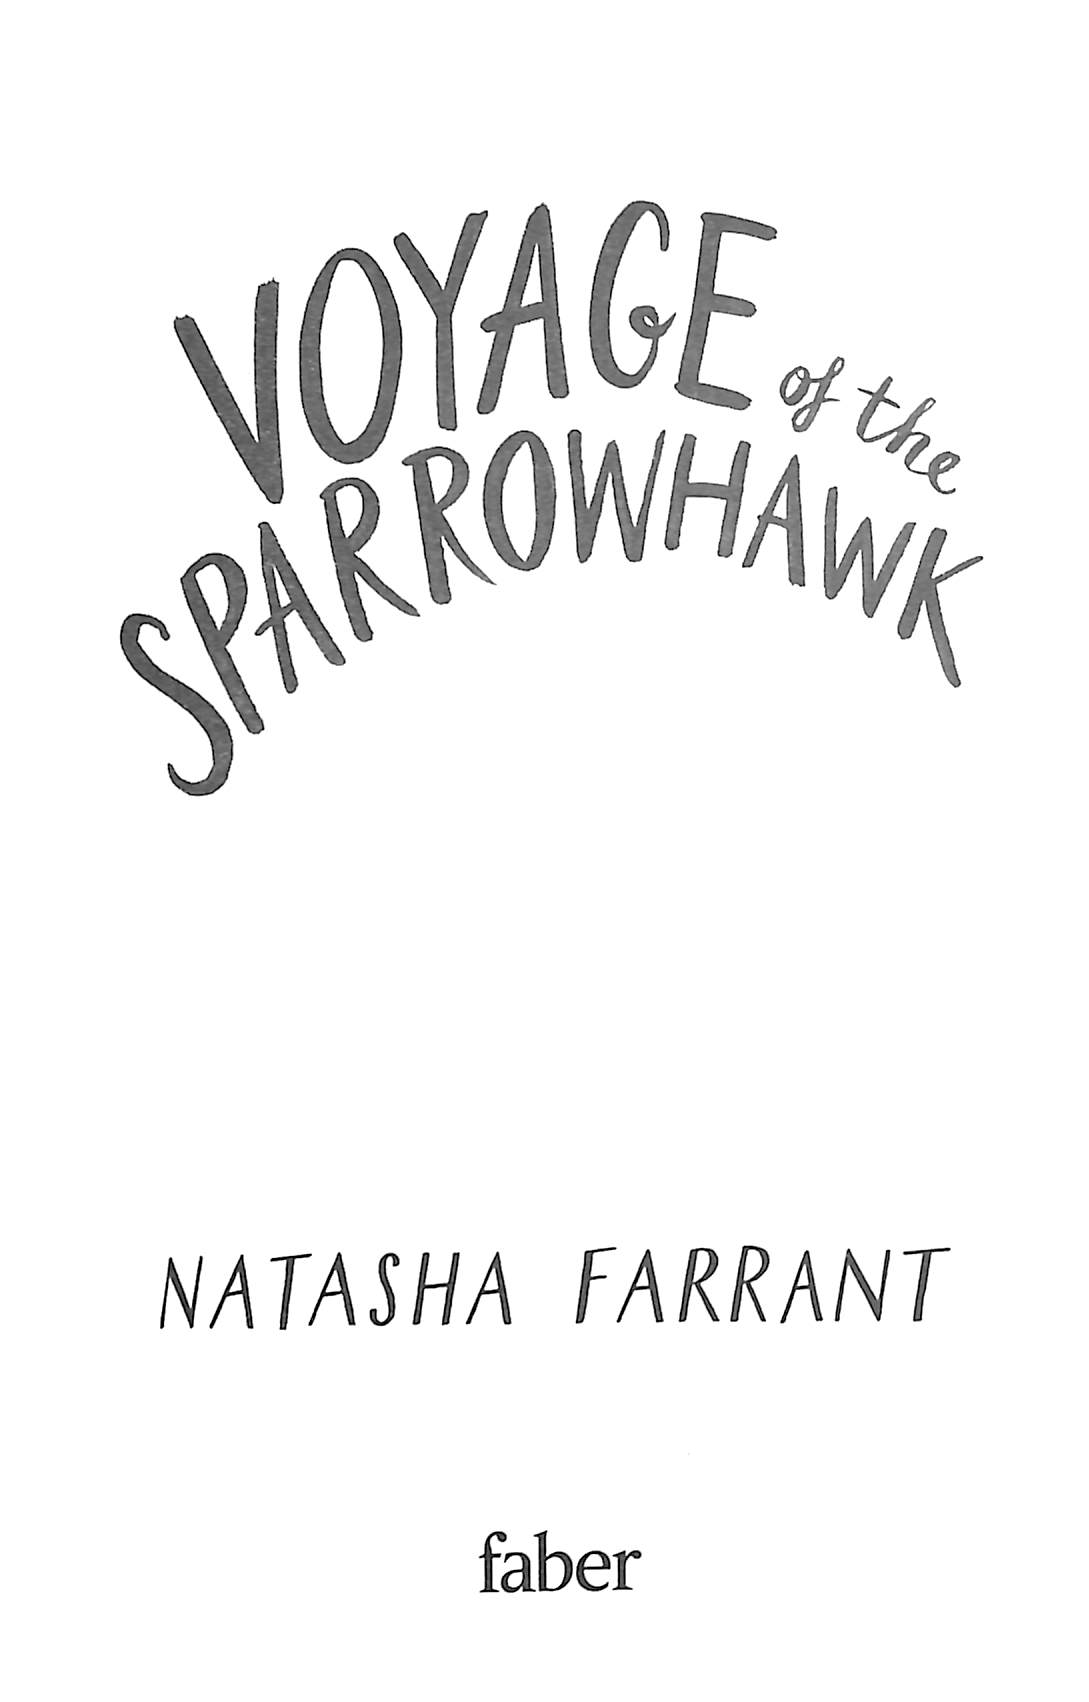 Voyage of the Sparrowhawk by Farrant, Natasha (Literary